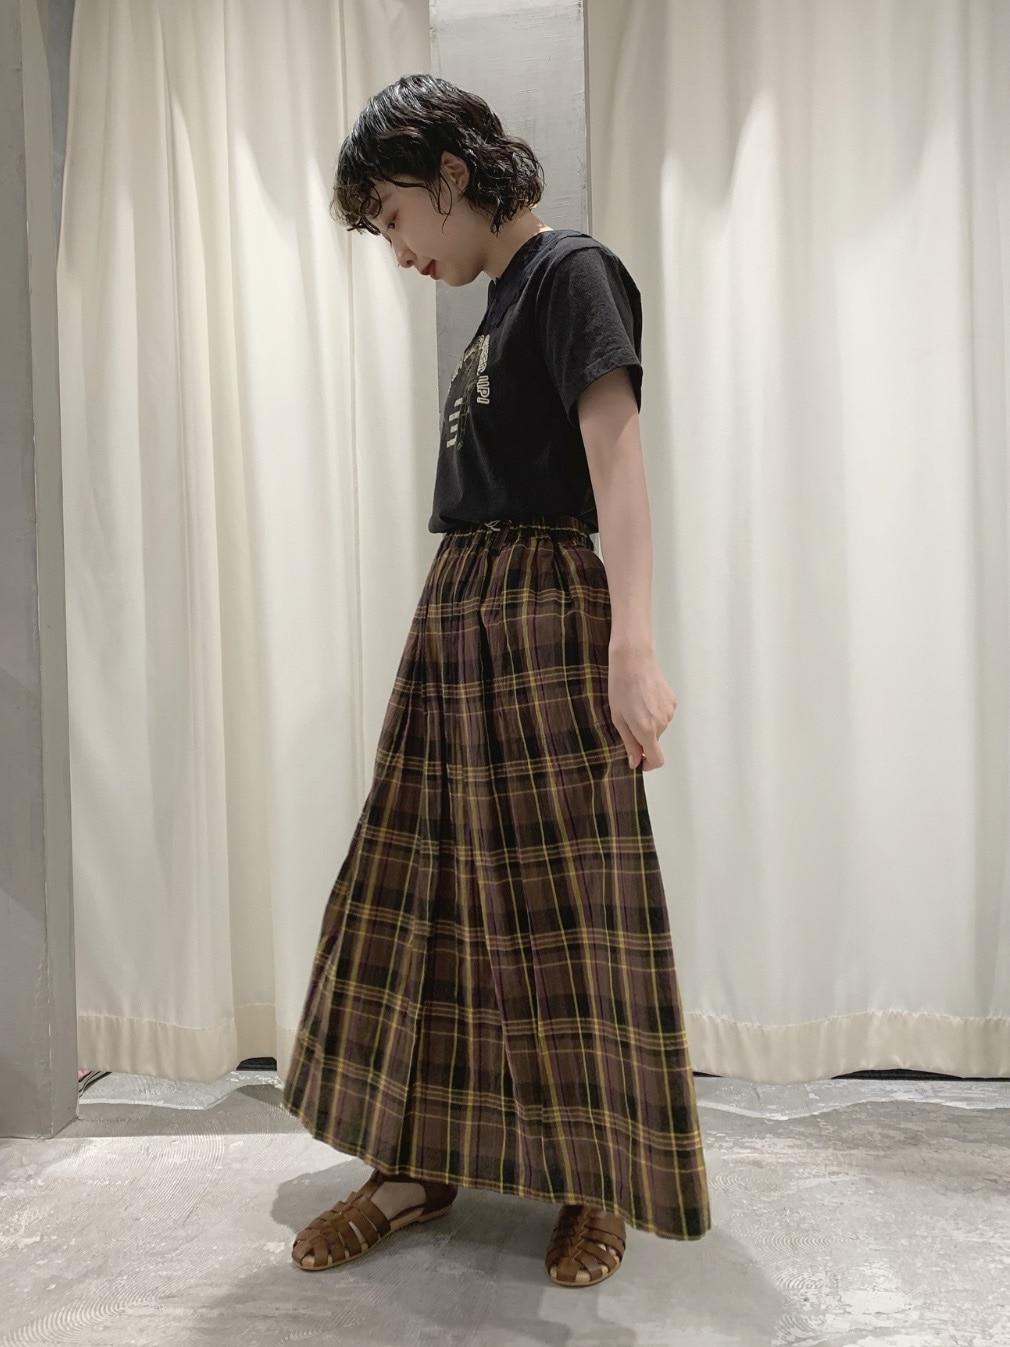 AMB SHOP CHILD WOMAN CHILD WOMAN , PAR ICI ルミネ横浜 身長:158cm 2020.06.11